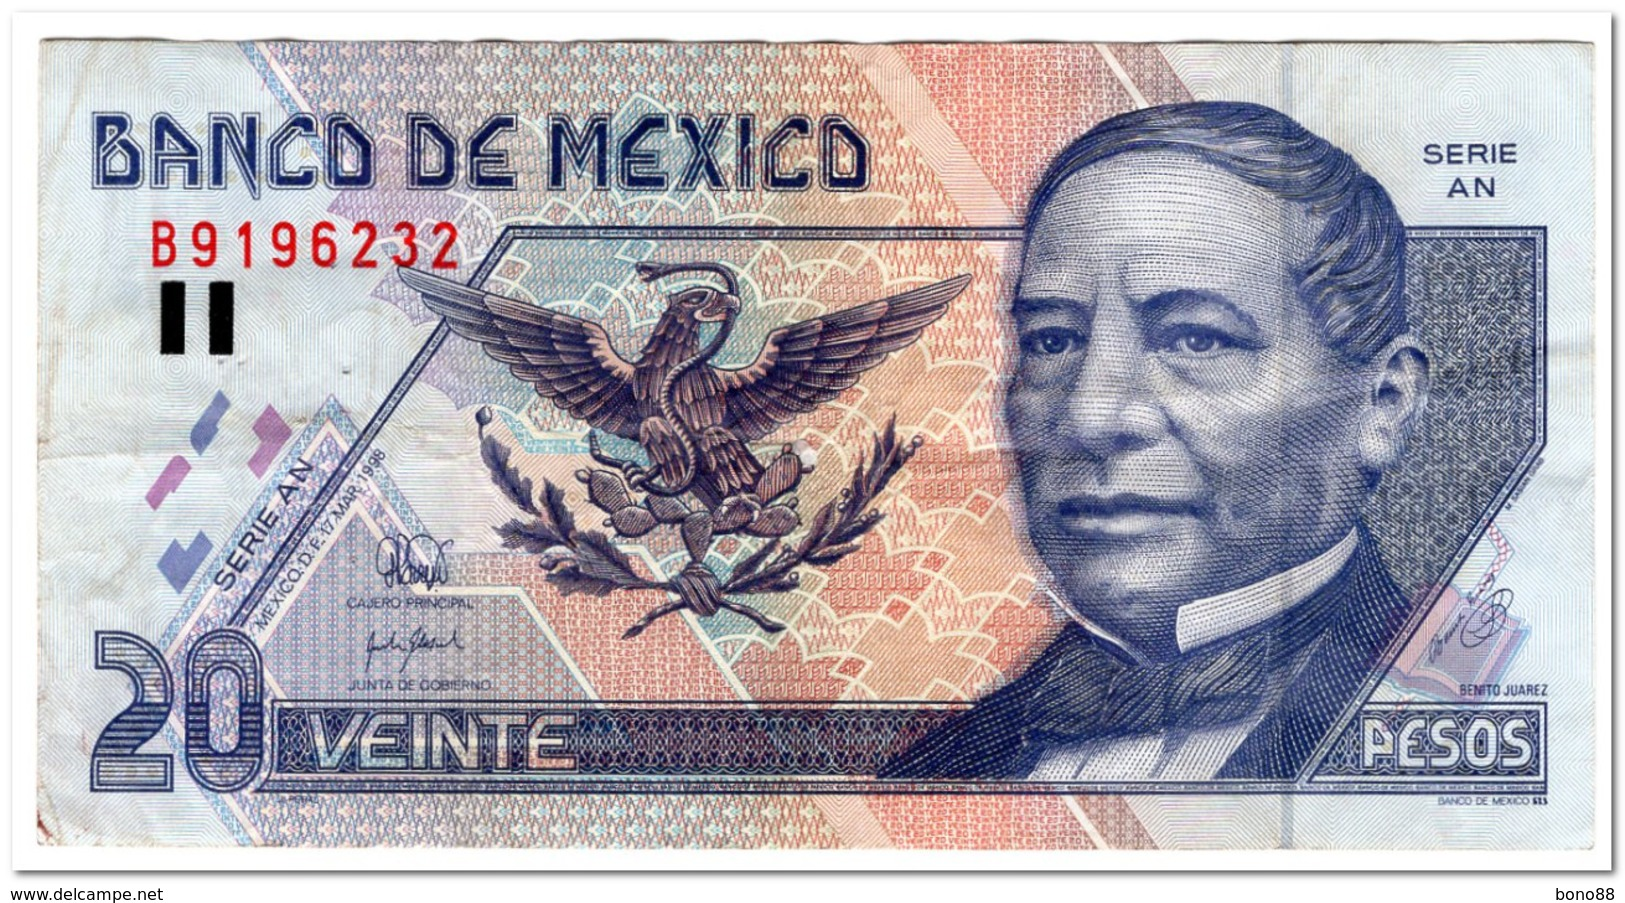 MEXICO,20 PESO,P.106c,,1998,VF,FEW PINHOLES - Mexico